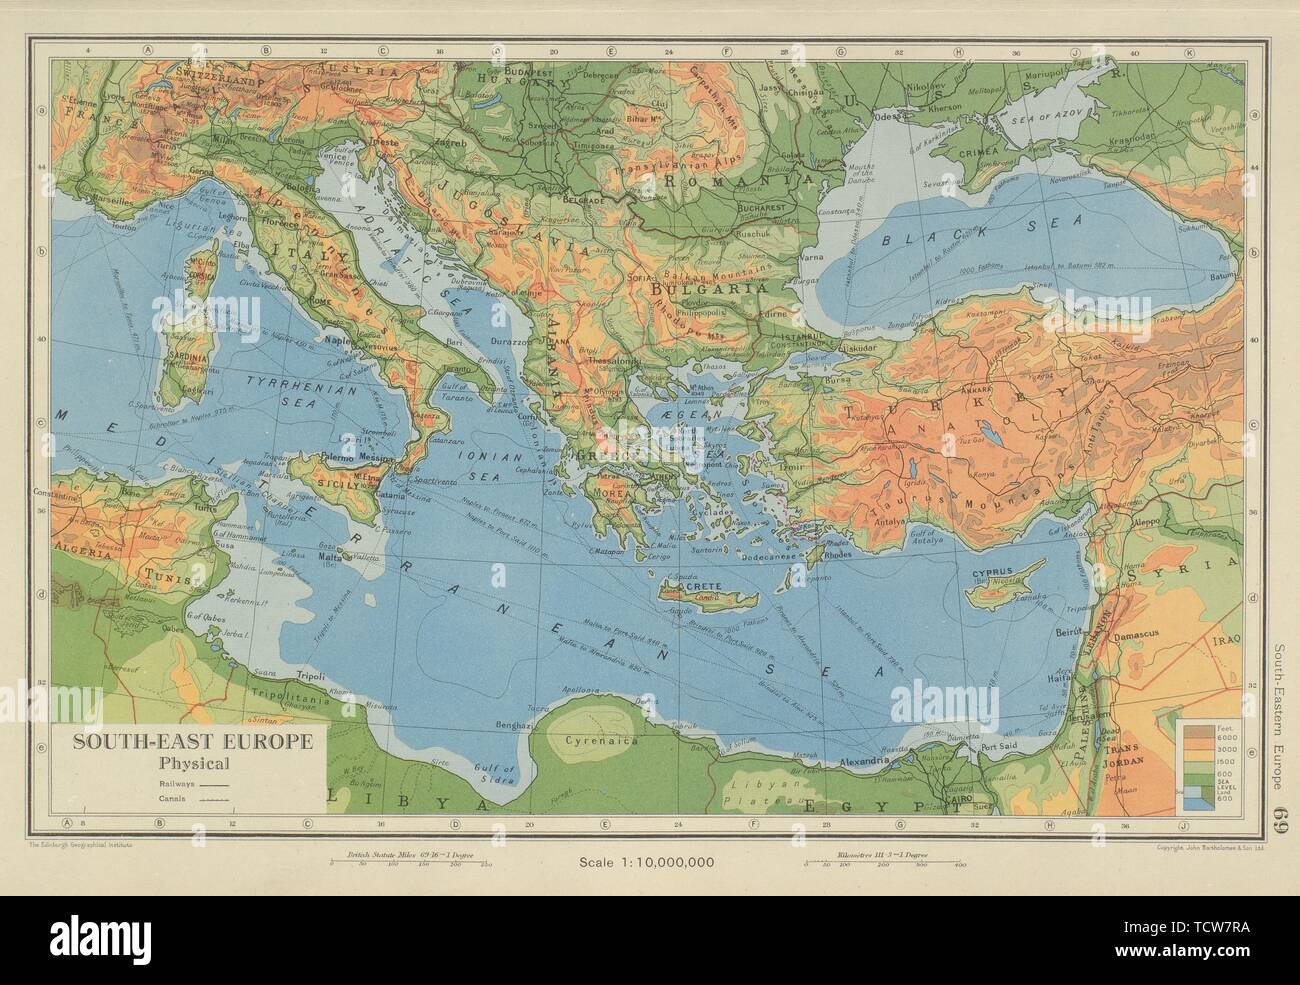 Map Of Eastern Italy.South Eastern Europe Eastern Mediterranean Balkans Greece Turkey